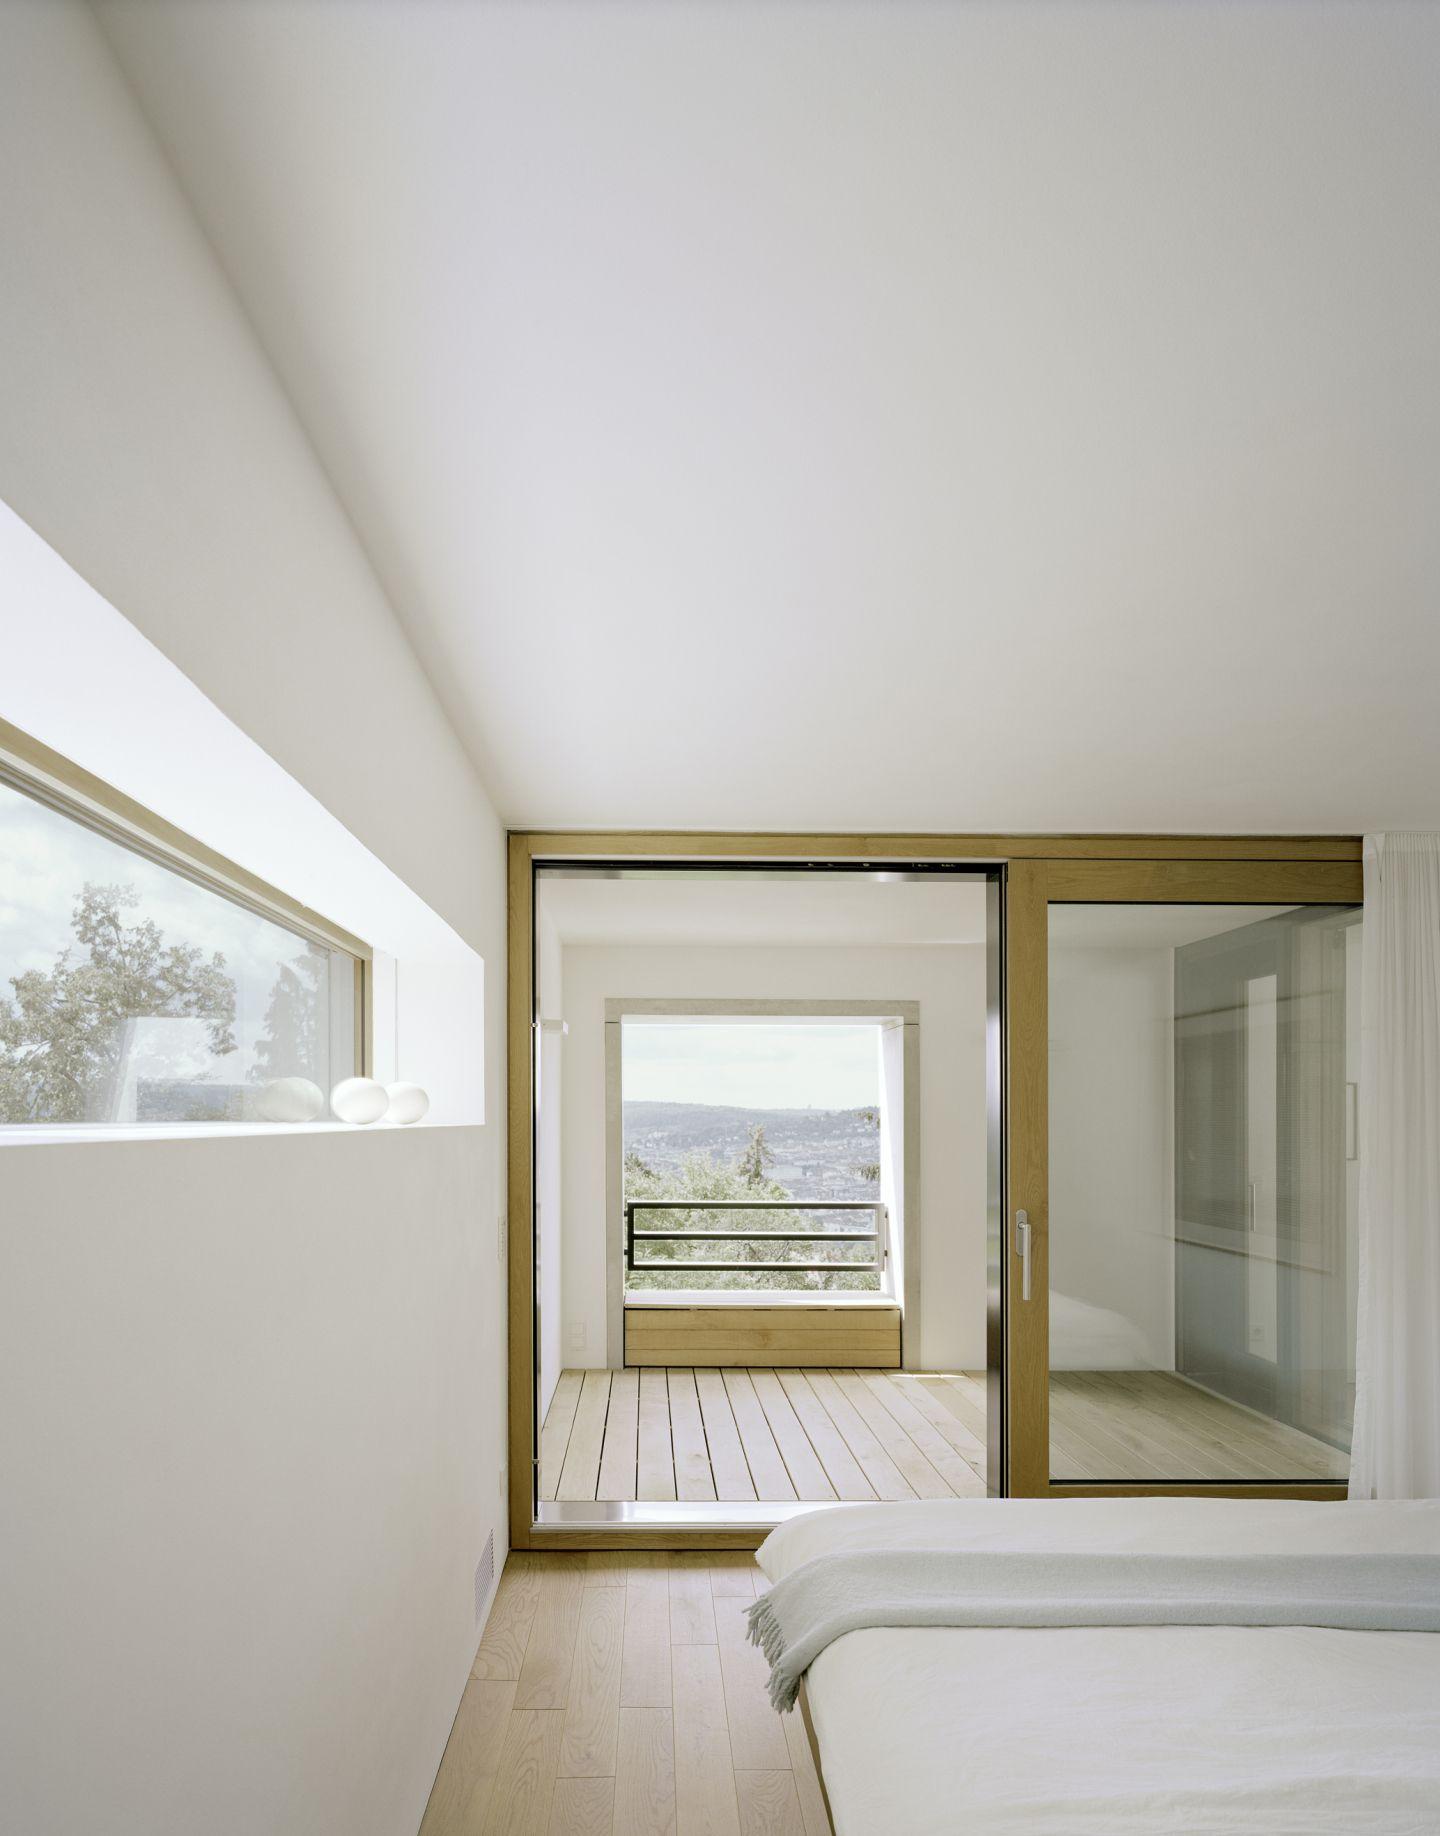 naturnah wohnen am stuttgarter tazzelwurm. Black Bedroom Furniture Sets. Home Design Ideas